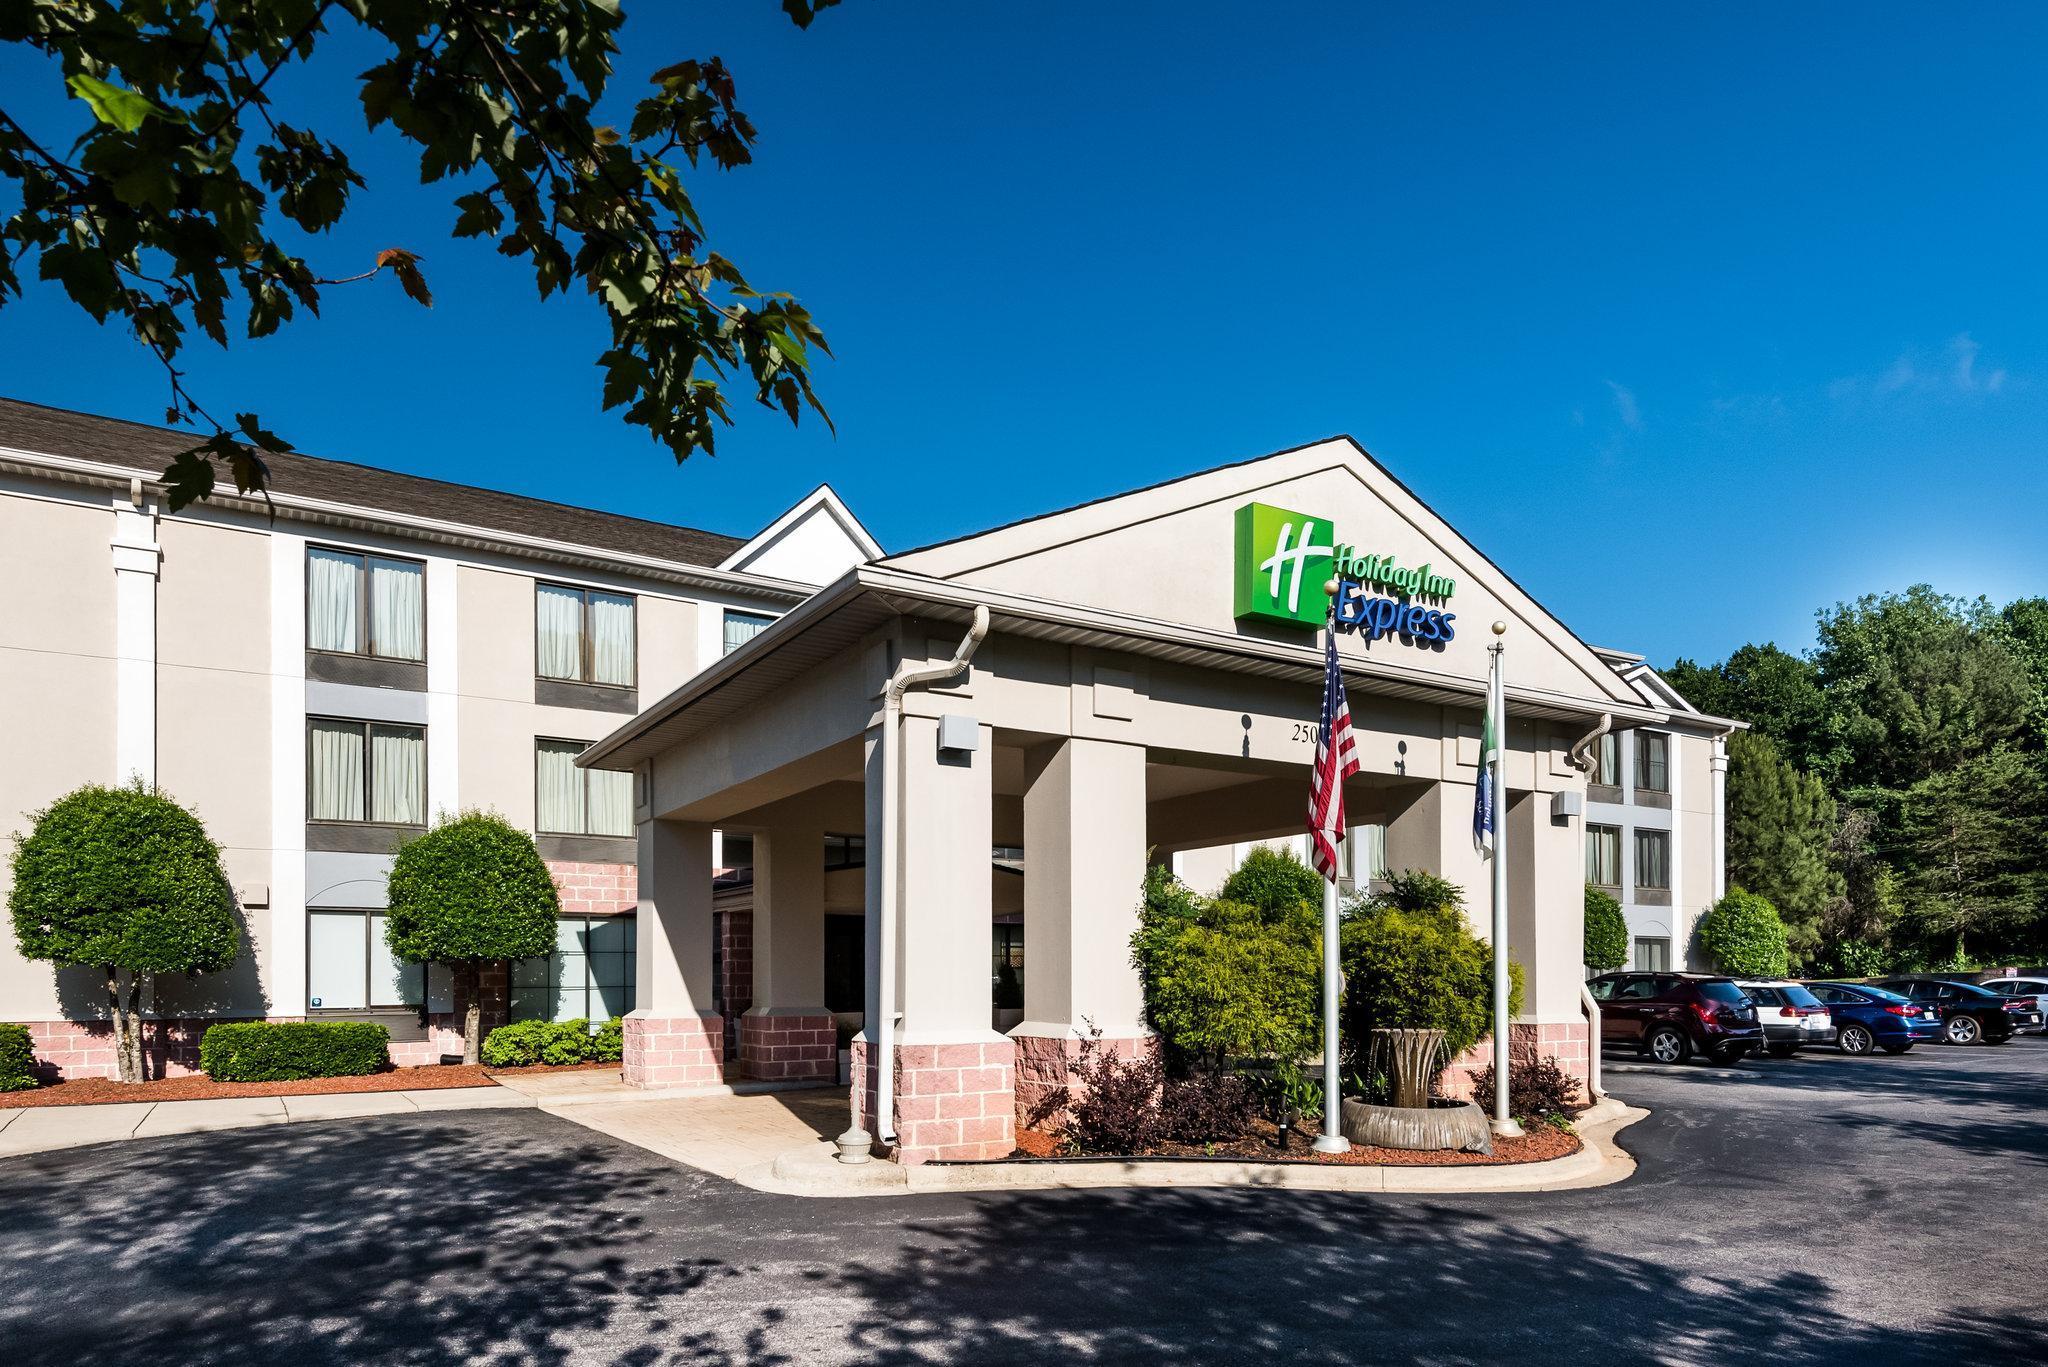 Holiday Inn Express Hotel & Suites Charlotte Arpt-Belmont, Gaston